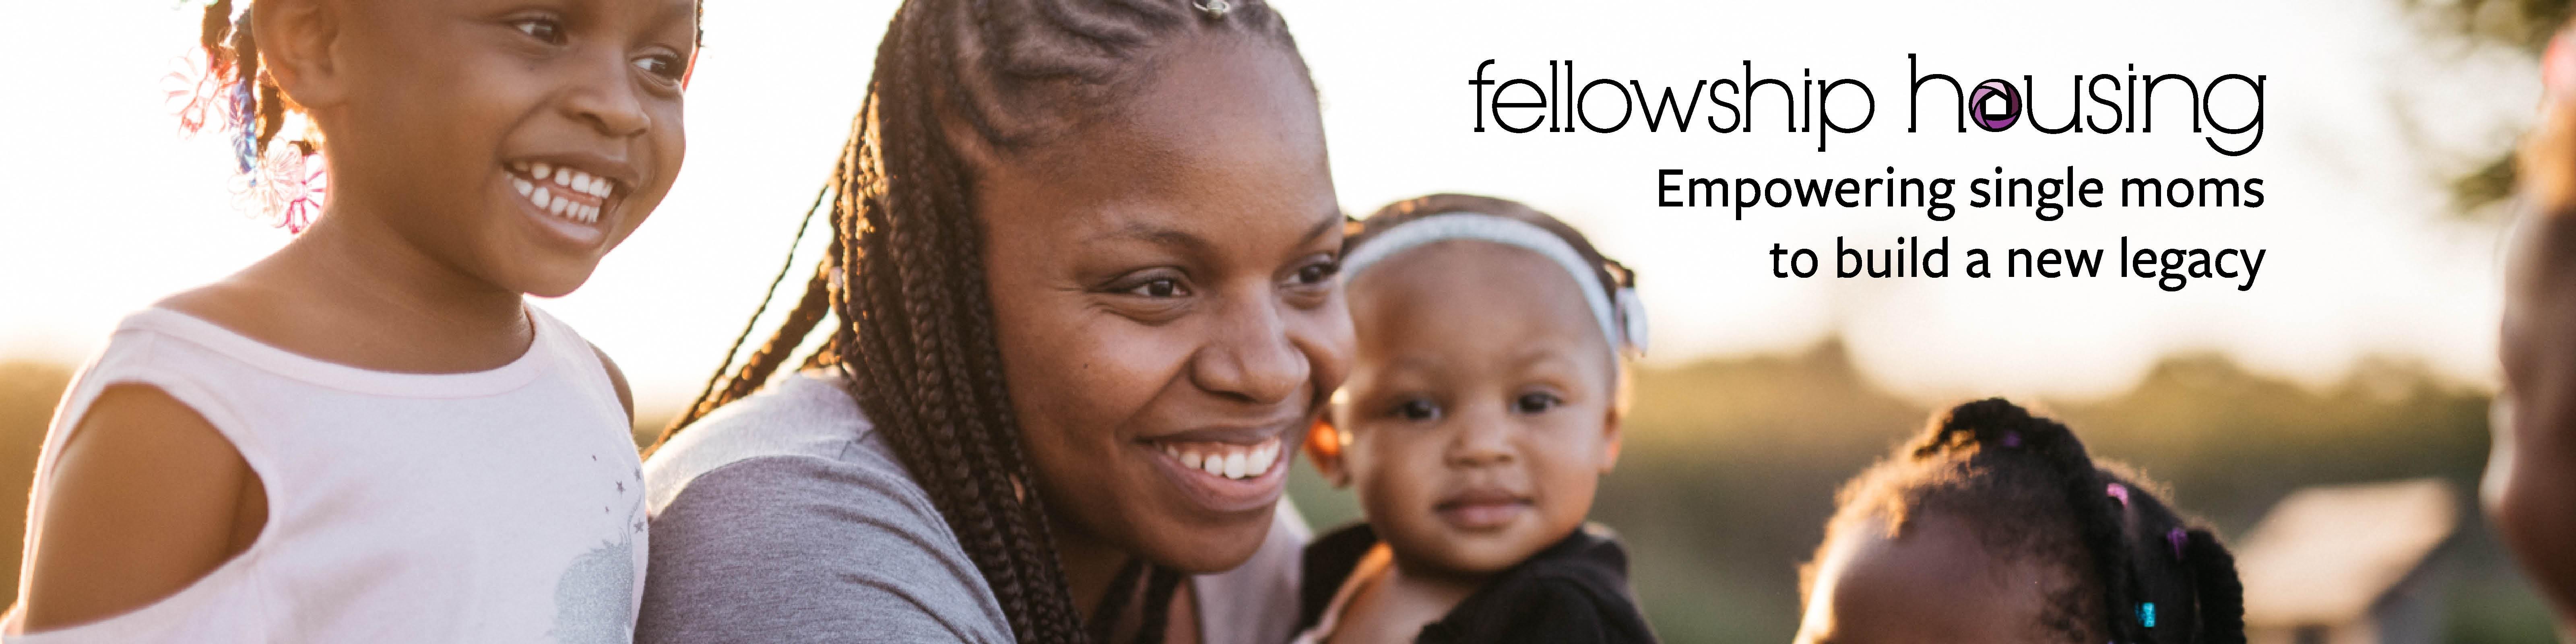 Fellowship Housing Linkedin